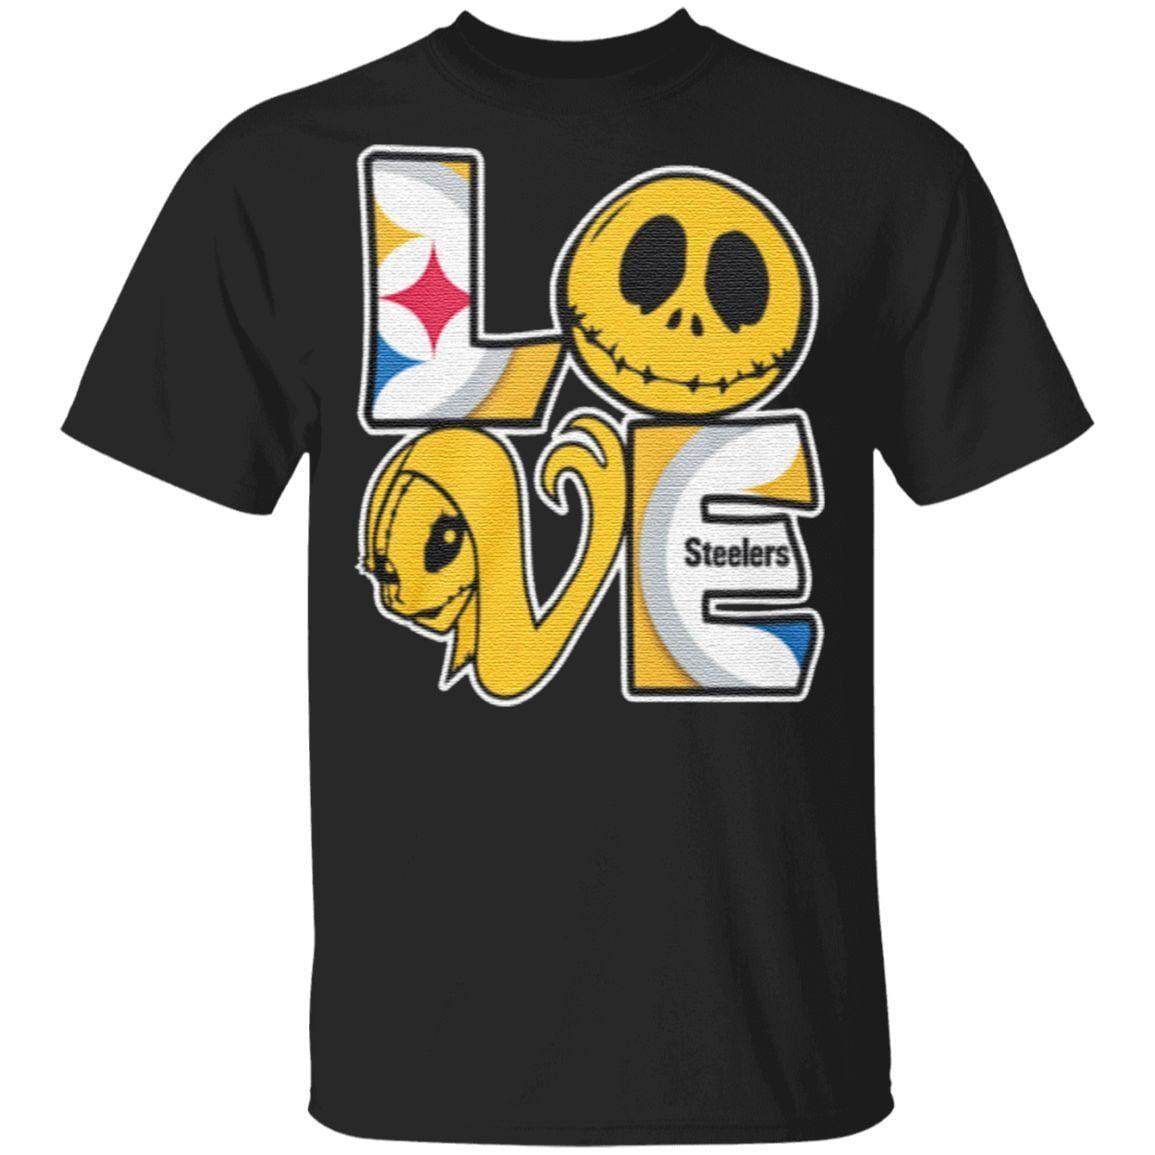 Jack Skellington and Sally love Pittsburgh Steelers t shirt